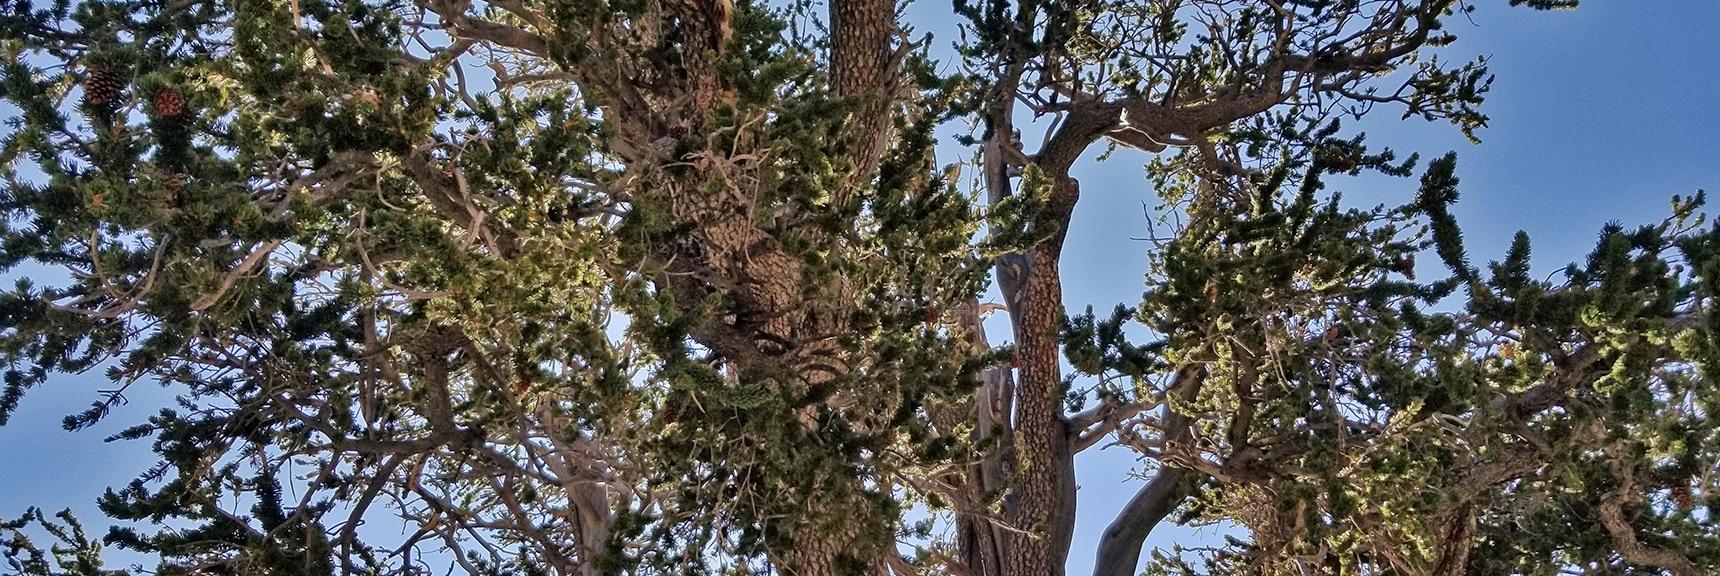 3000-Year-Old Raintree's Canopy | Mummy Springs Loop | Mt. Charleston Wilderness | Spring Mountains, Nevada